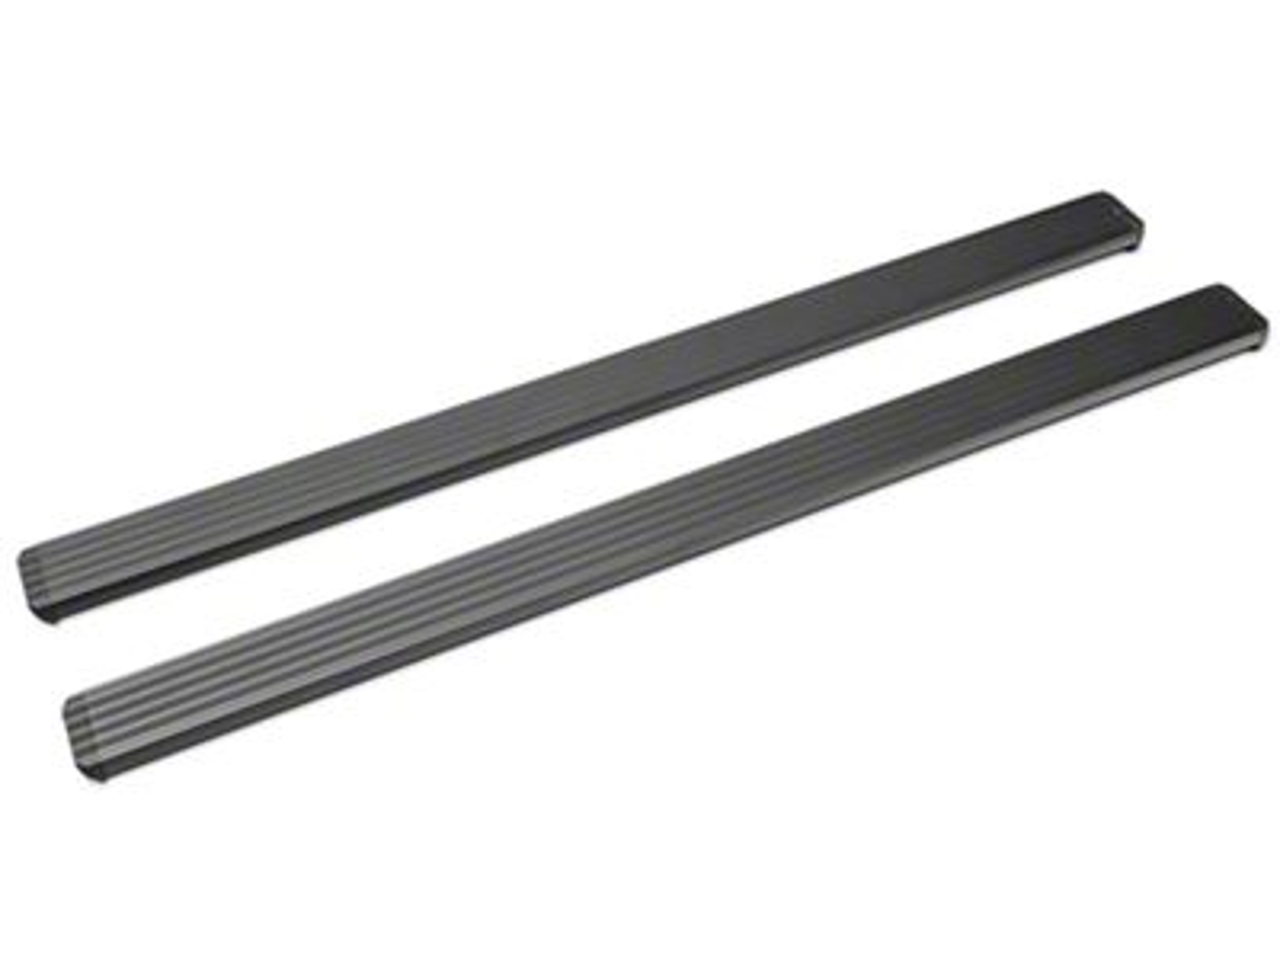 RedRock 4x4 I4 Aluminum Running Boards (05-19 Tacoma Access Cab)